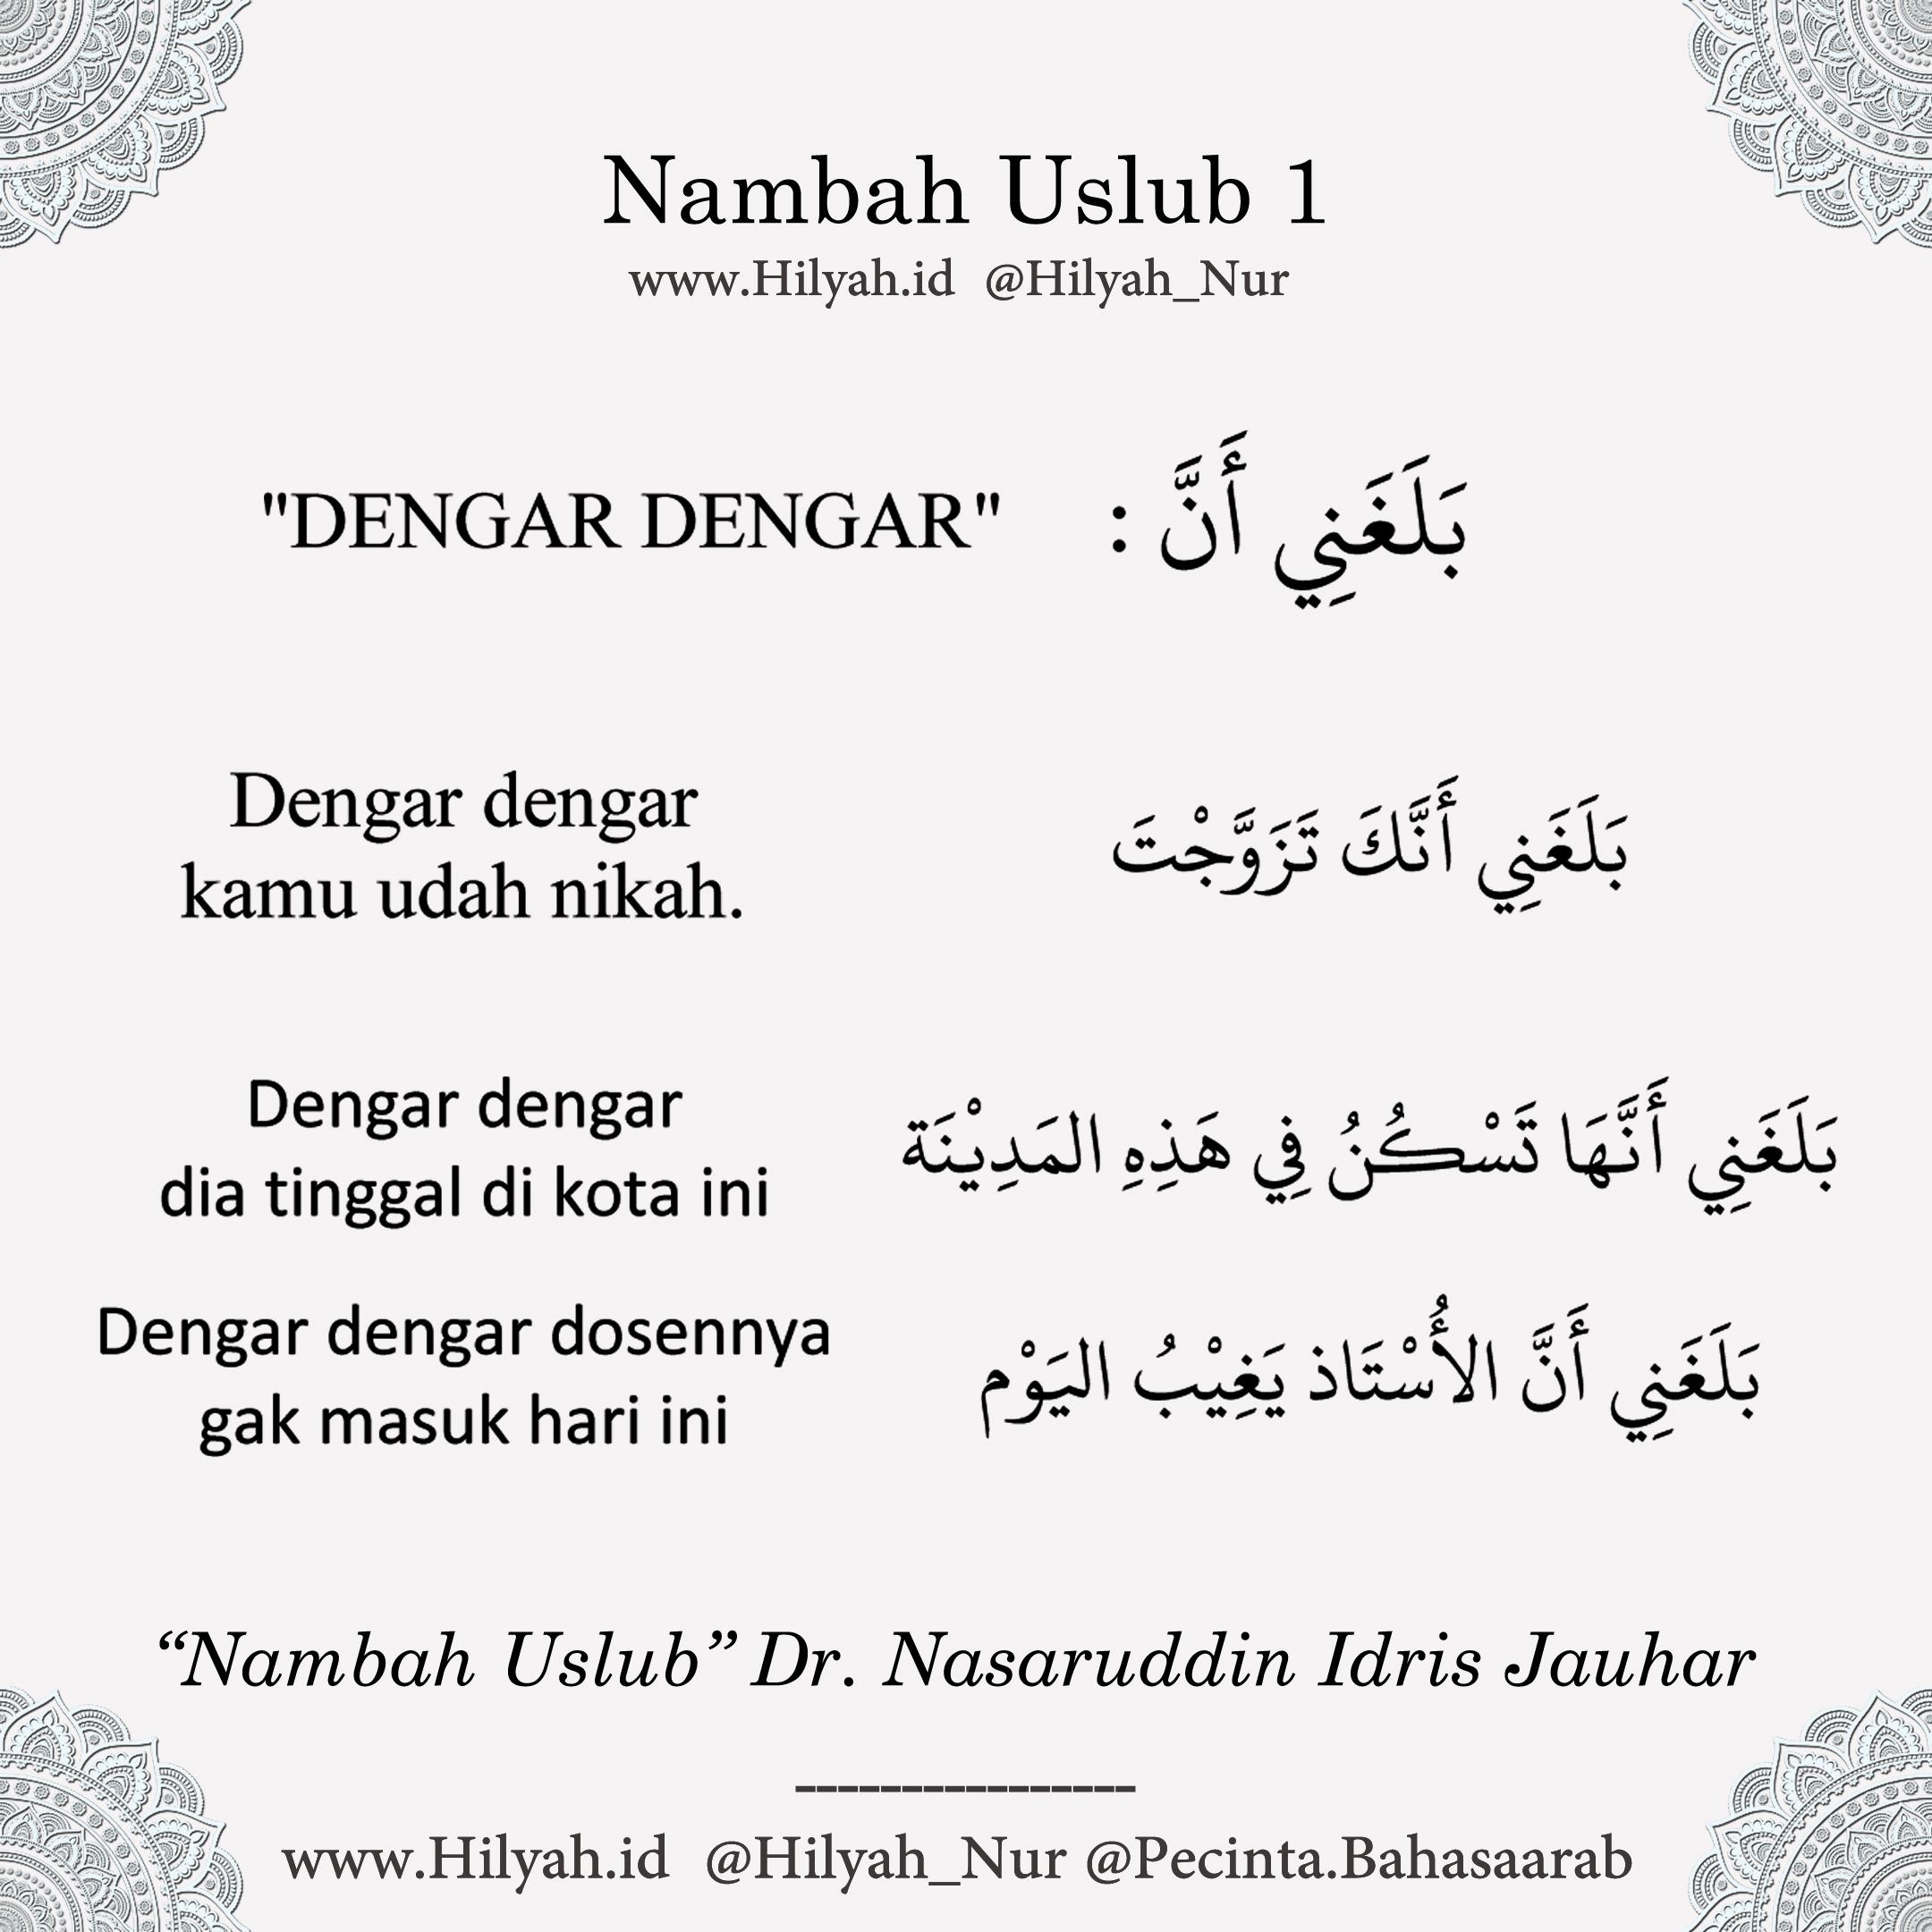 Uslub Bahasa Arab, Uslub Bahasa Arab Dr Nasaruddin Idris Jauhar